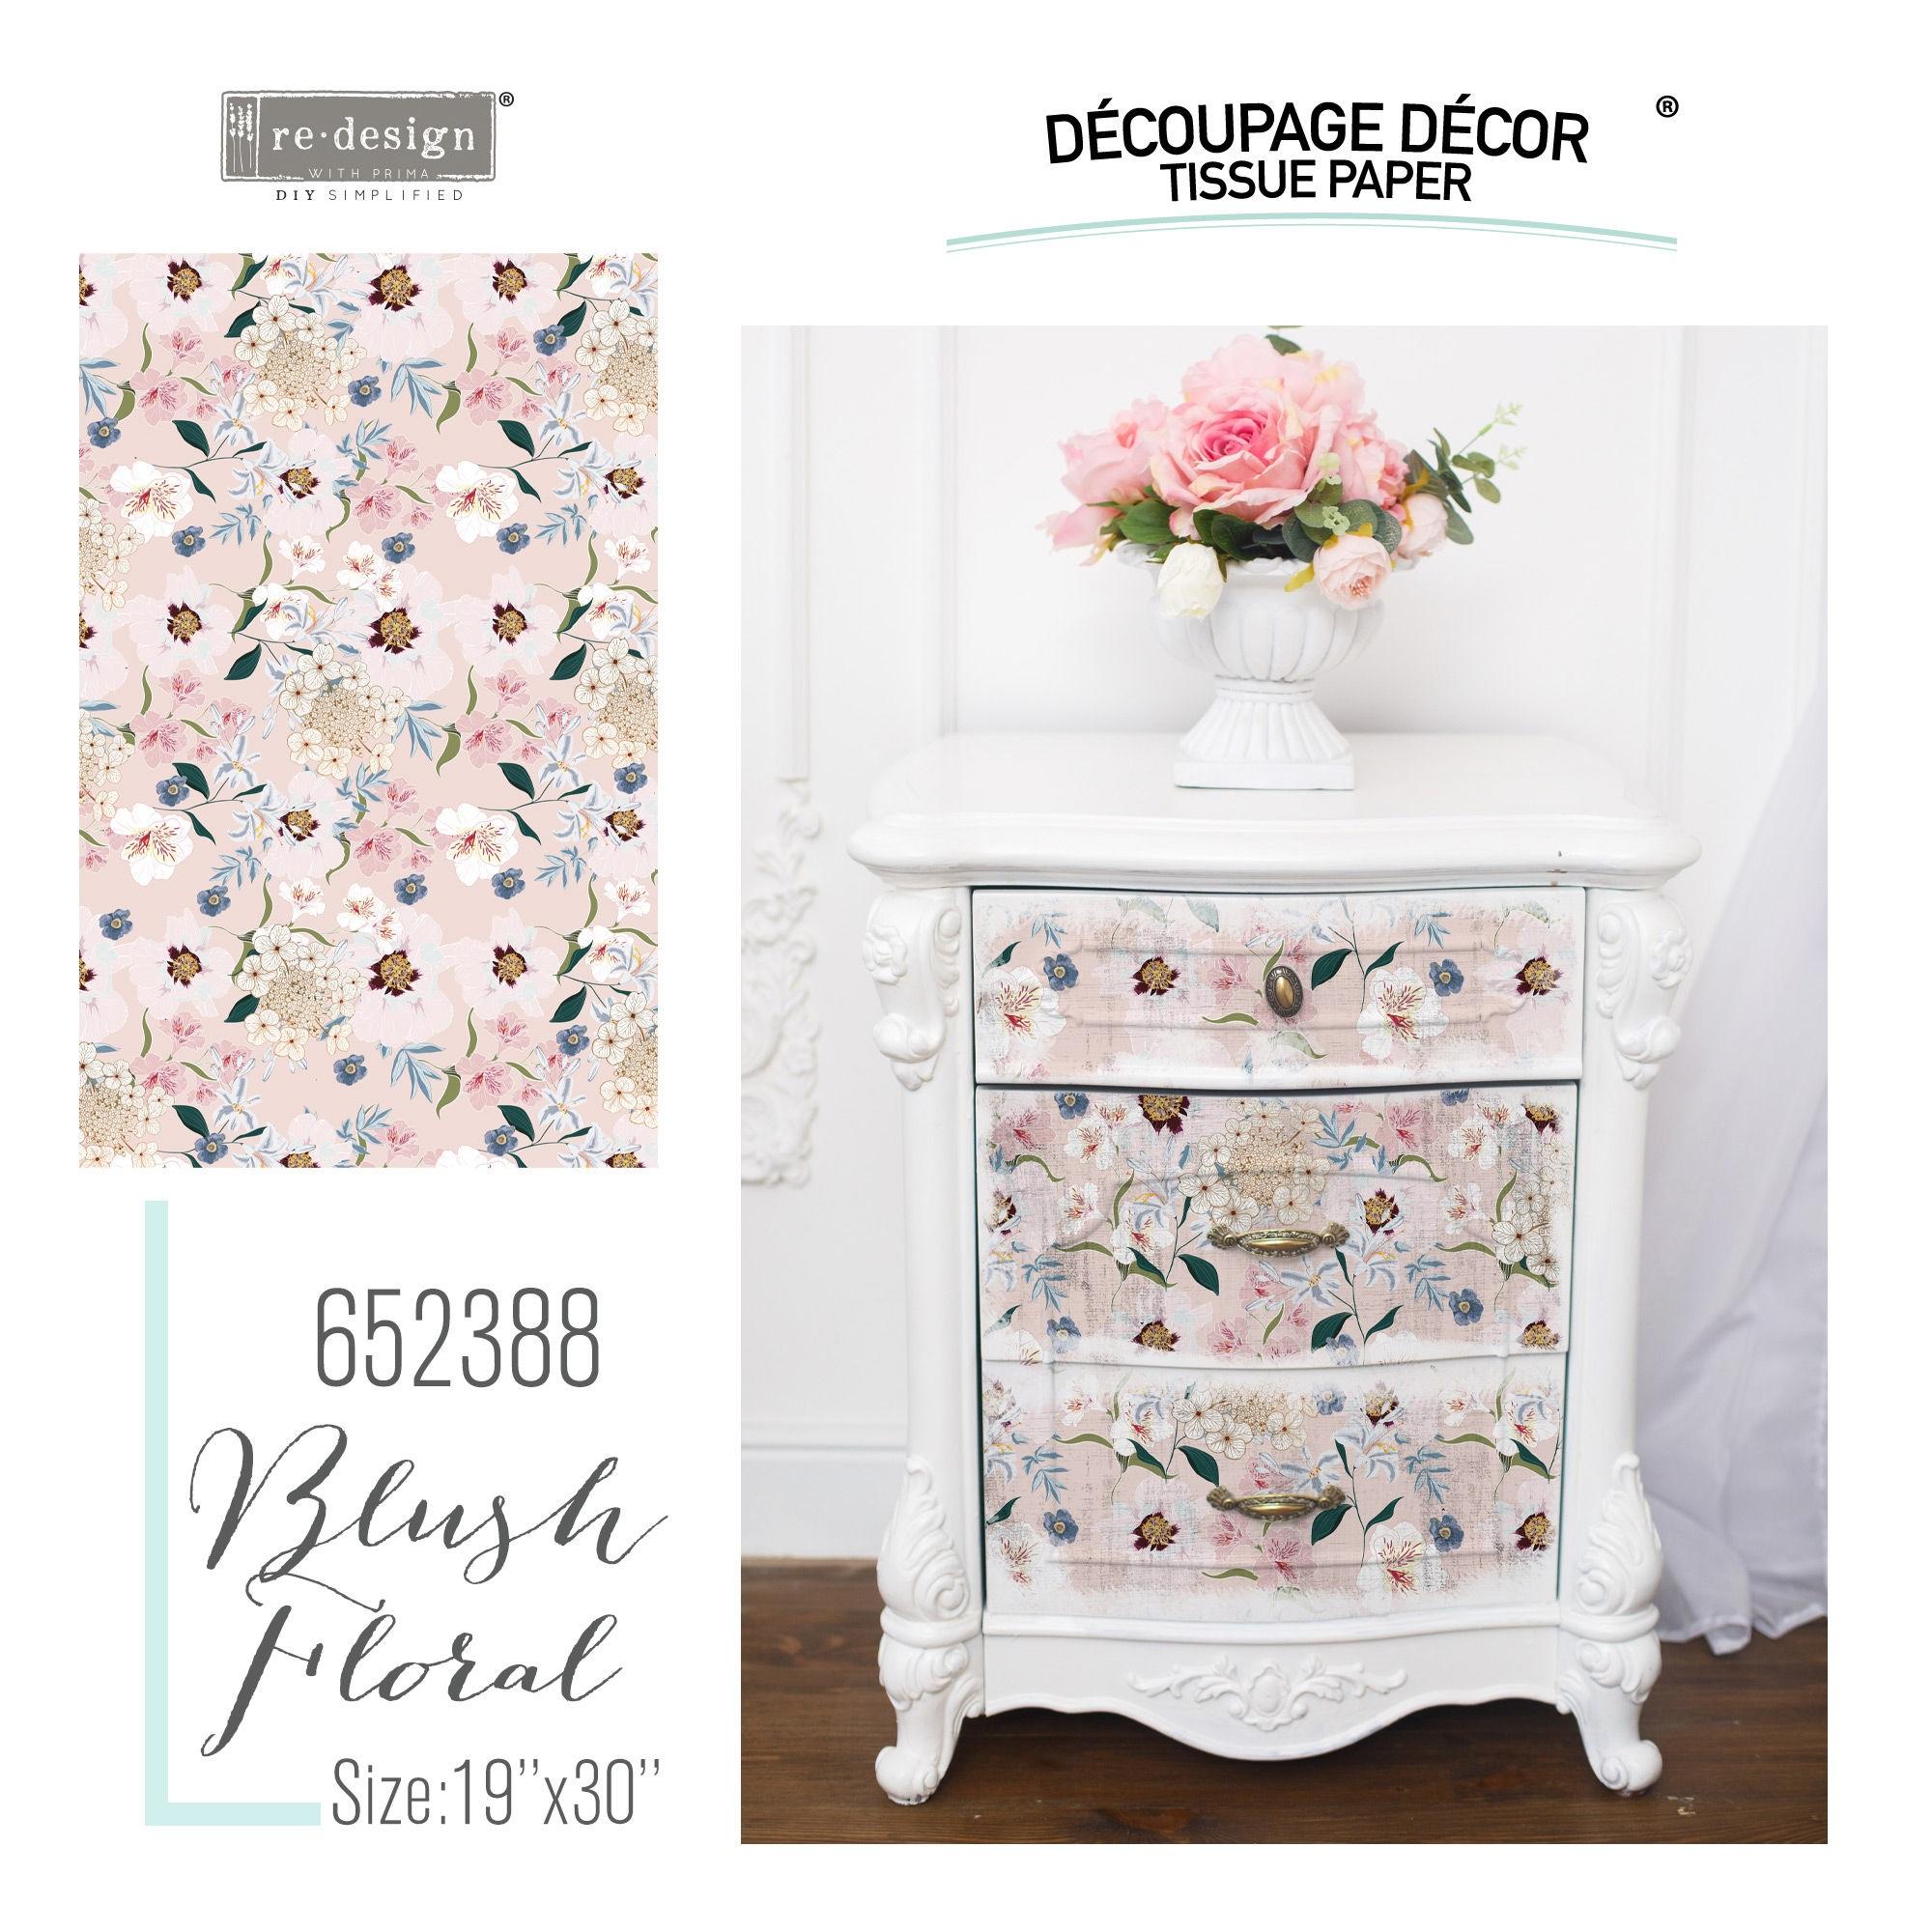 PRIMA Re Design Decoupage Tissue Paper Blush Floral